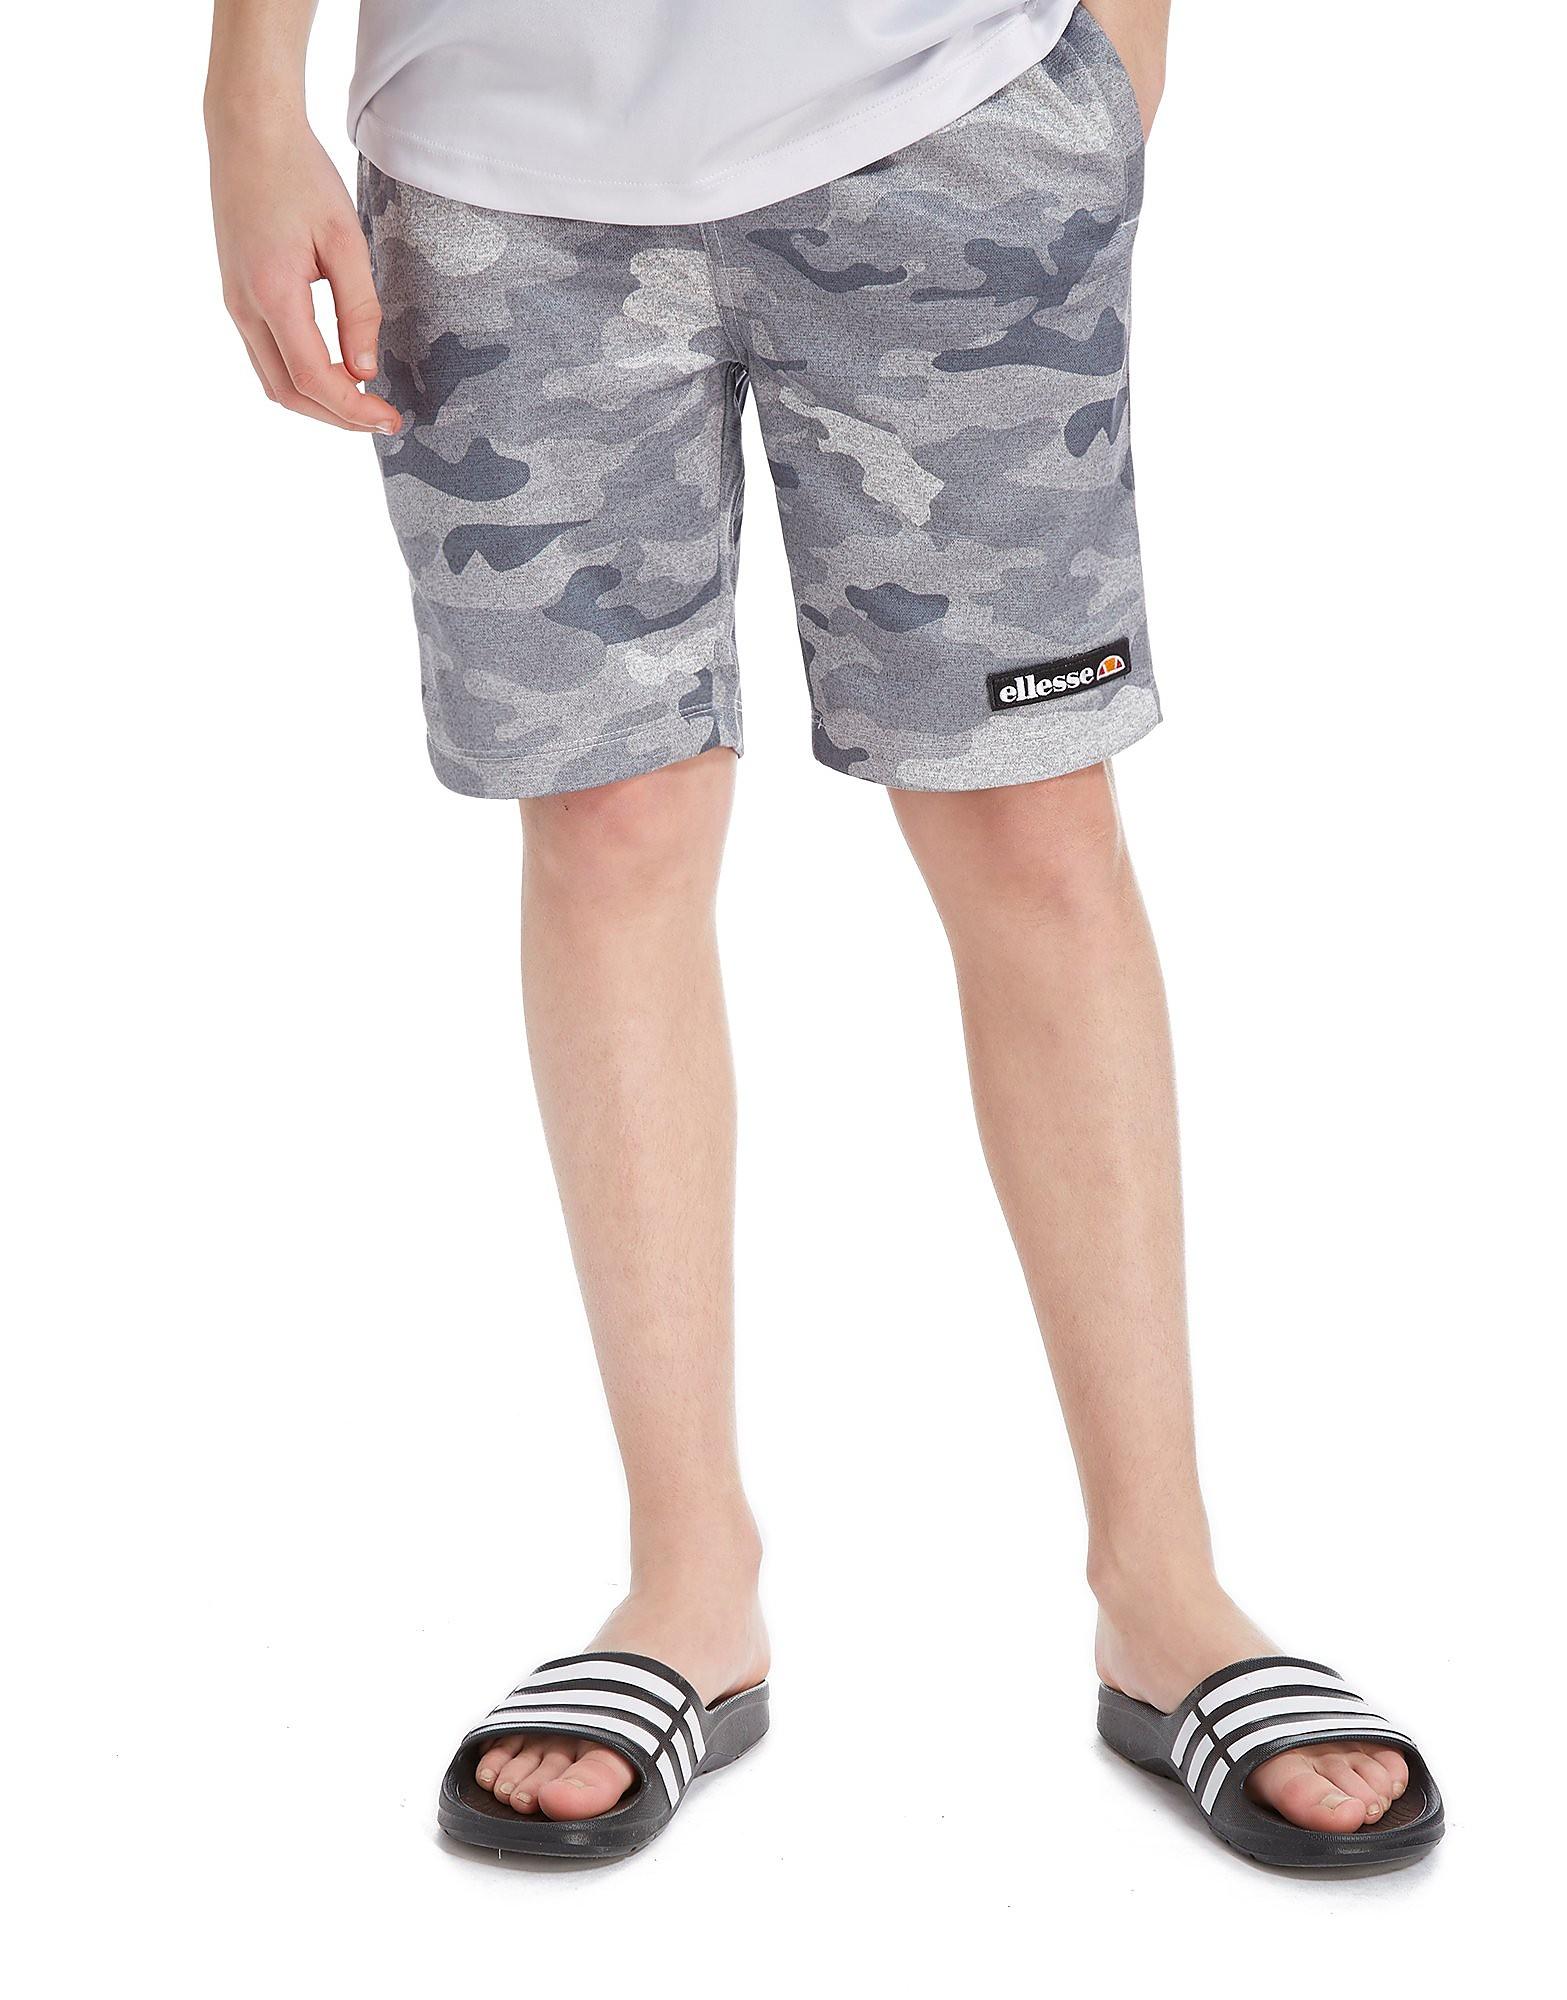 Ellesse Vianni Camo Fleece Shorts Junior